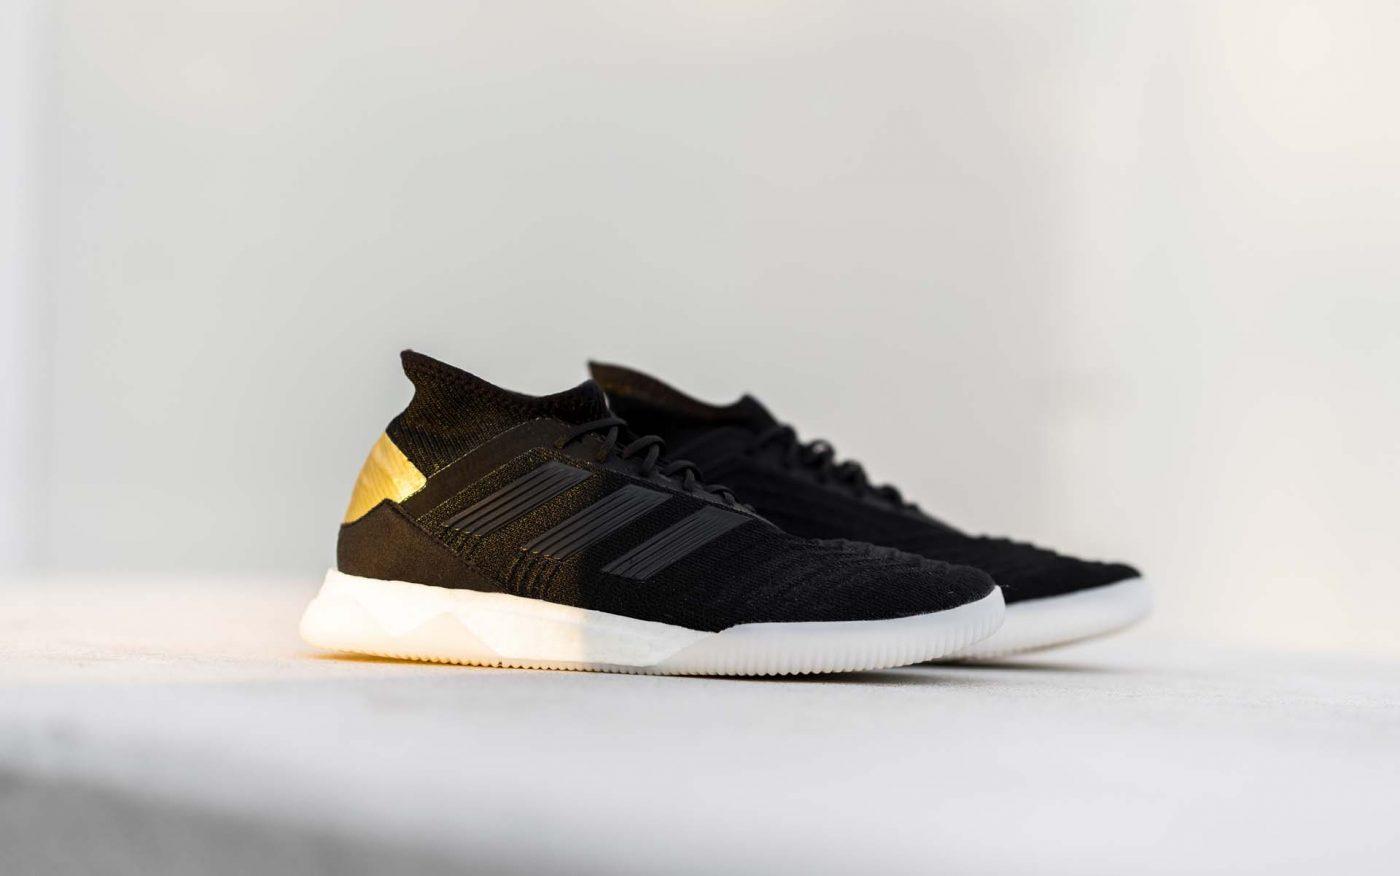 adidas-predator-19.1-input-code-3